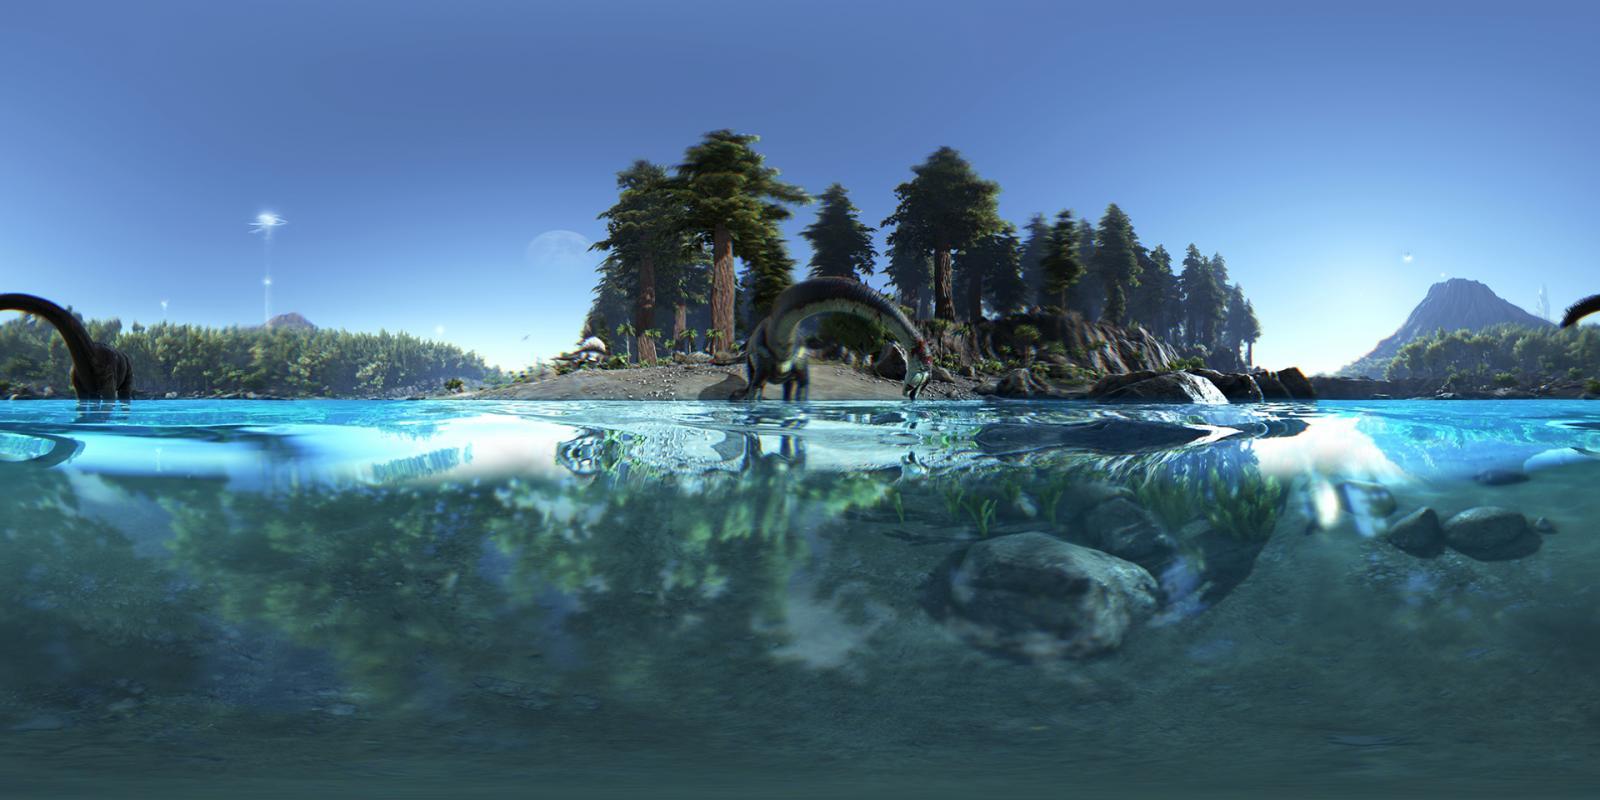 large.58b0fbe0b0b4d_FataL1ty-Brontoslikewater-Panoramic360Stereoscopic3D.jpg